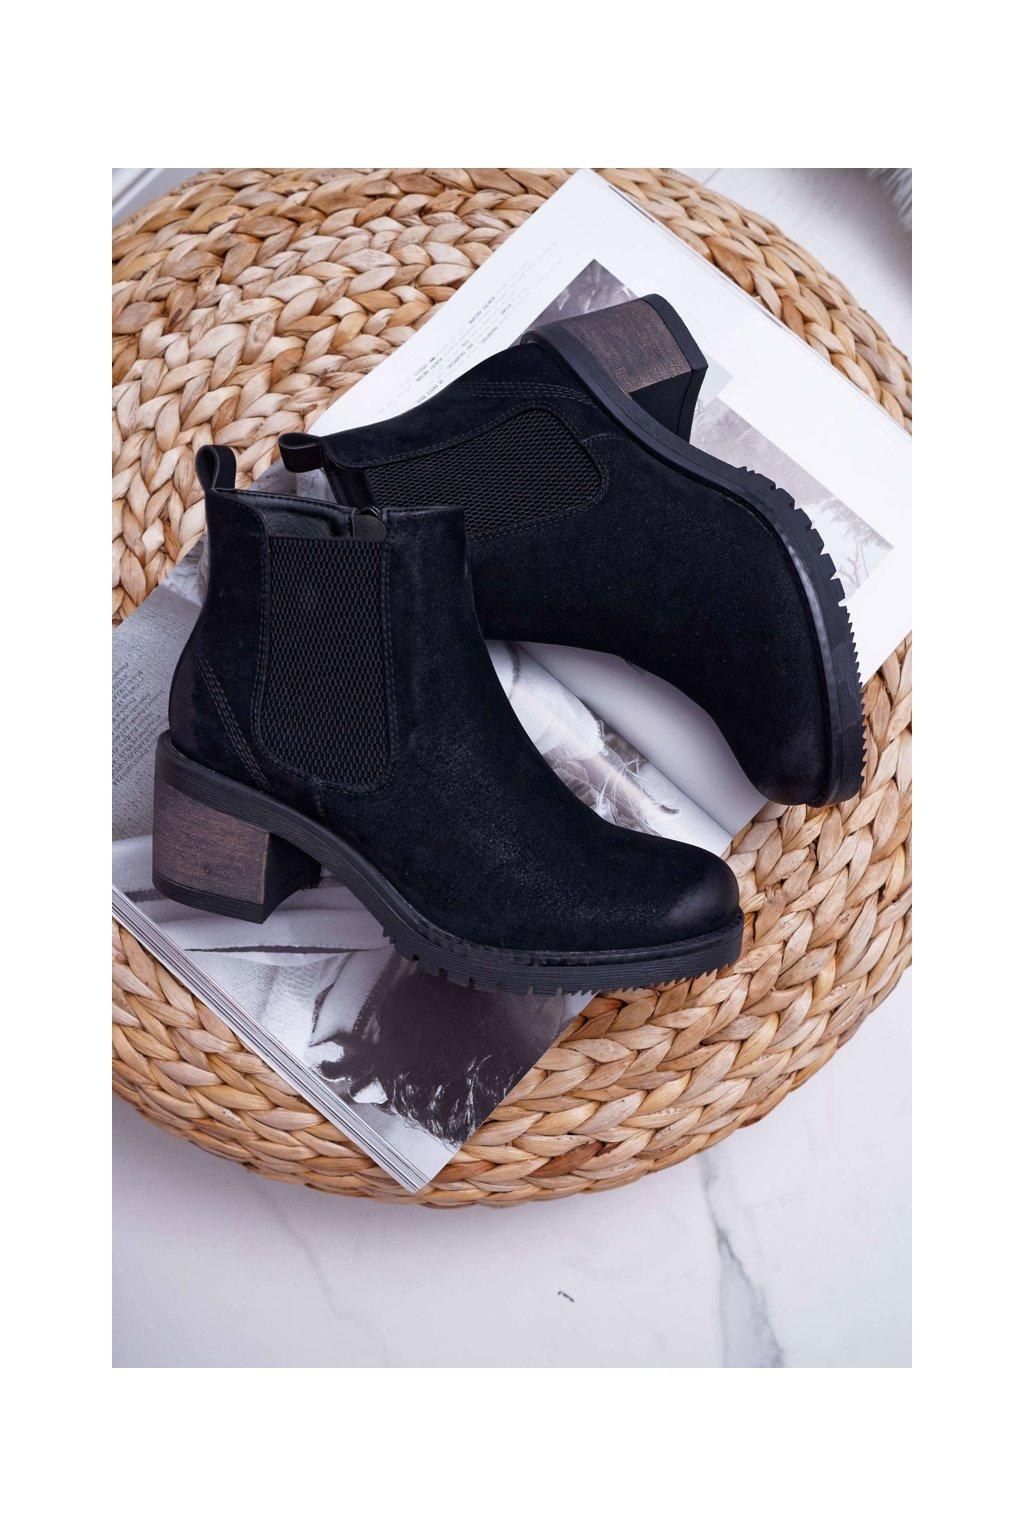 Dámske členkové topánky na podpätku Sergio Leone čierne BT702